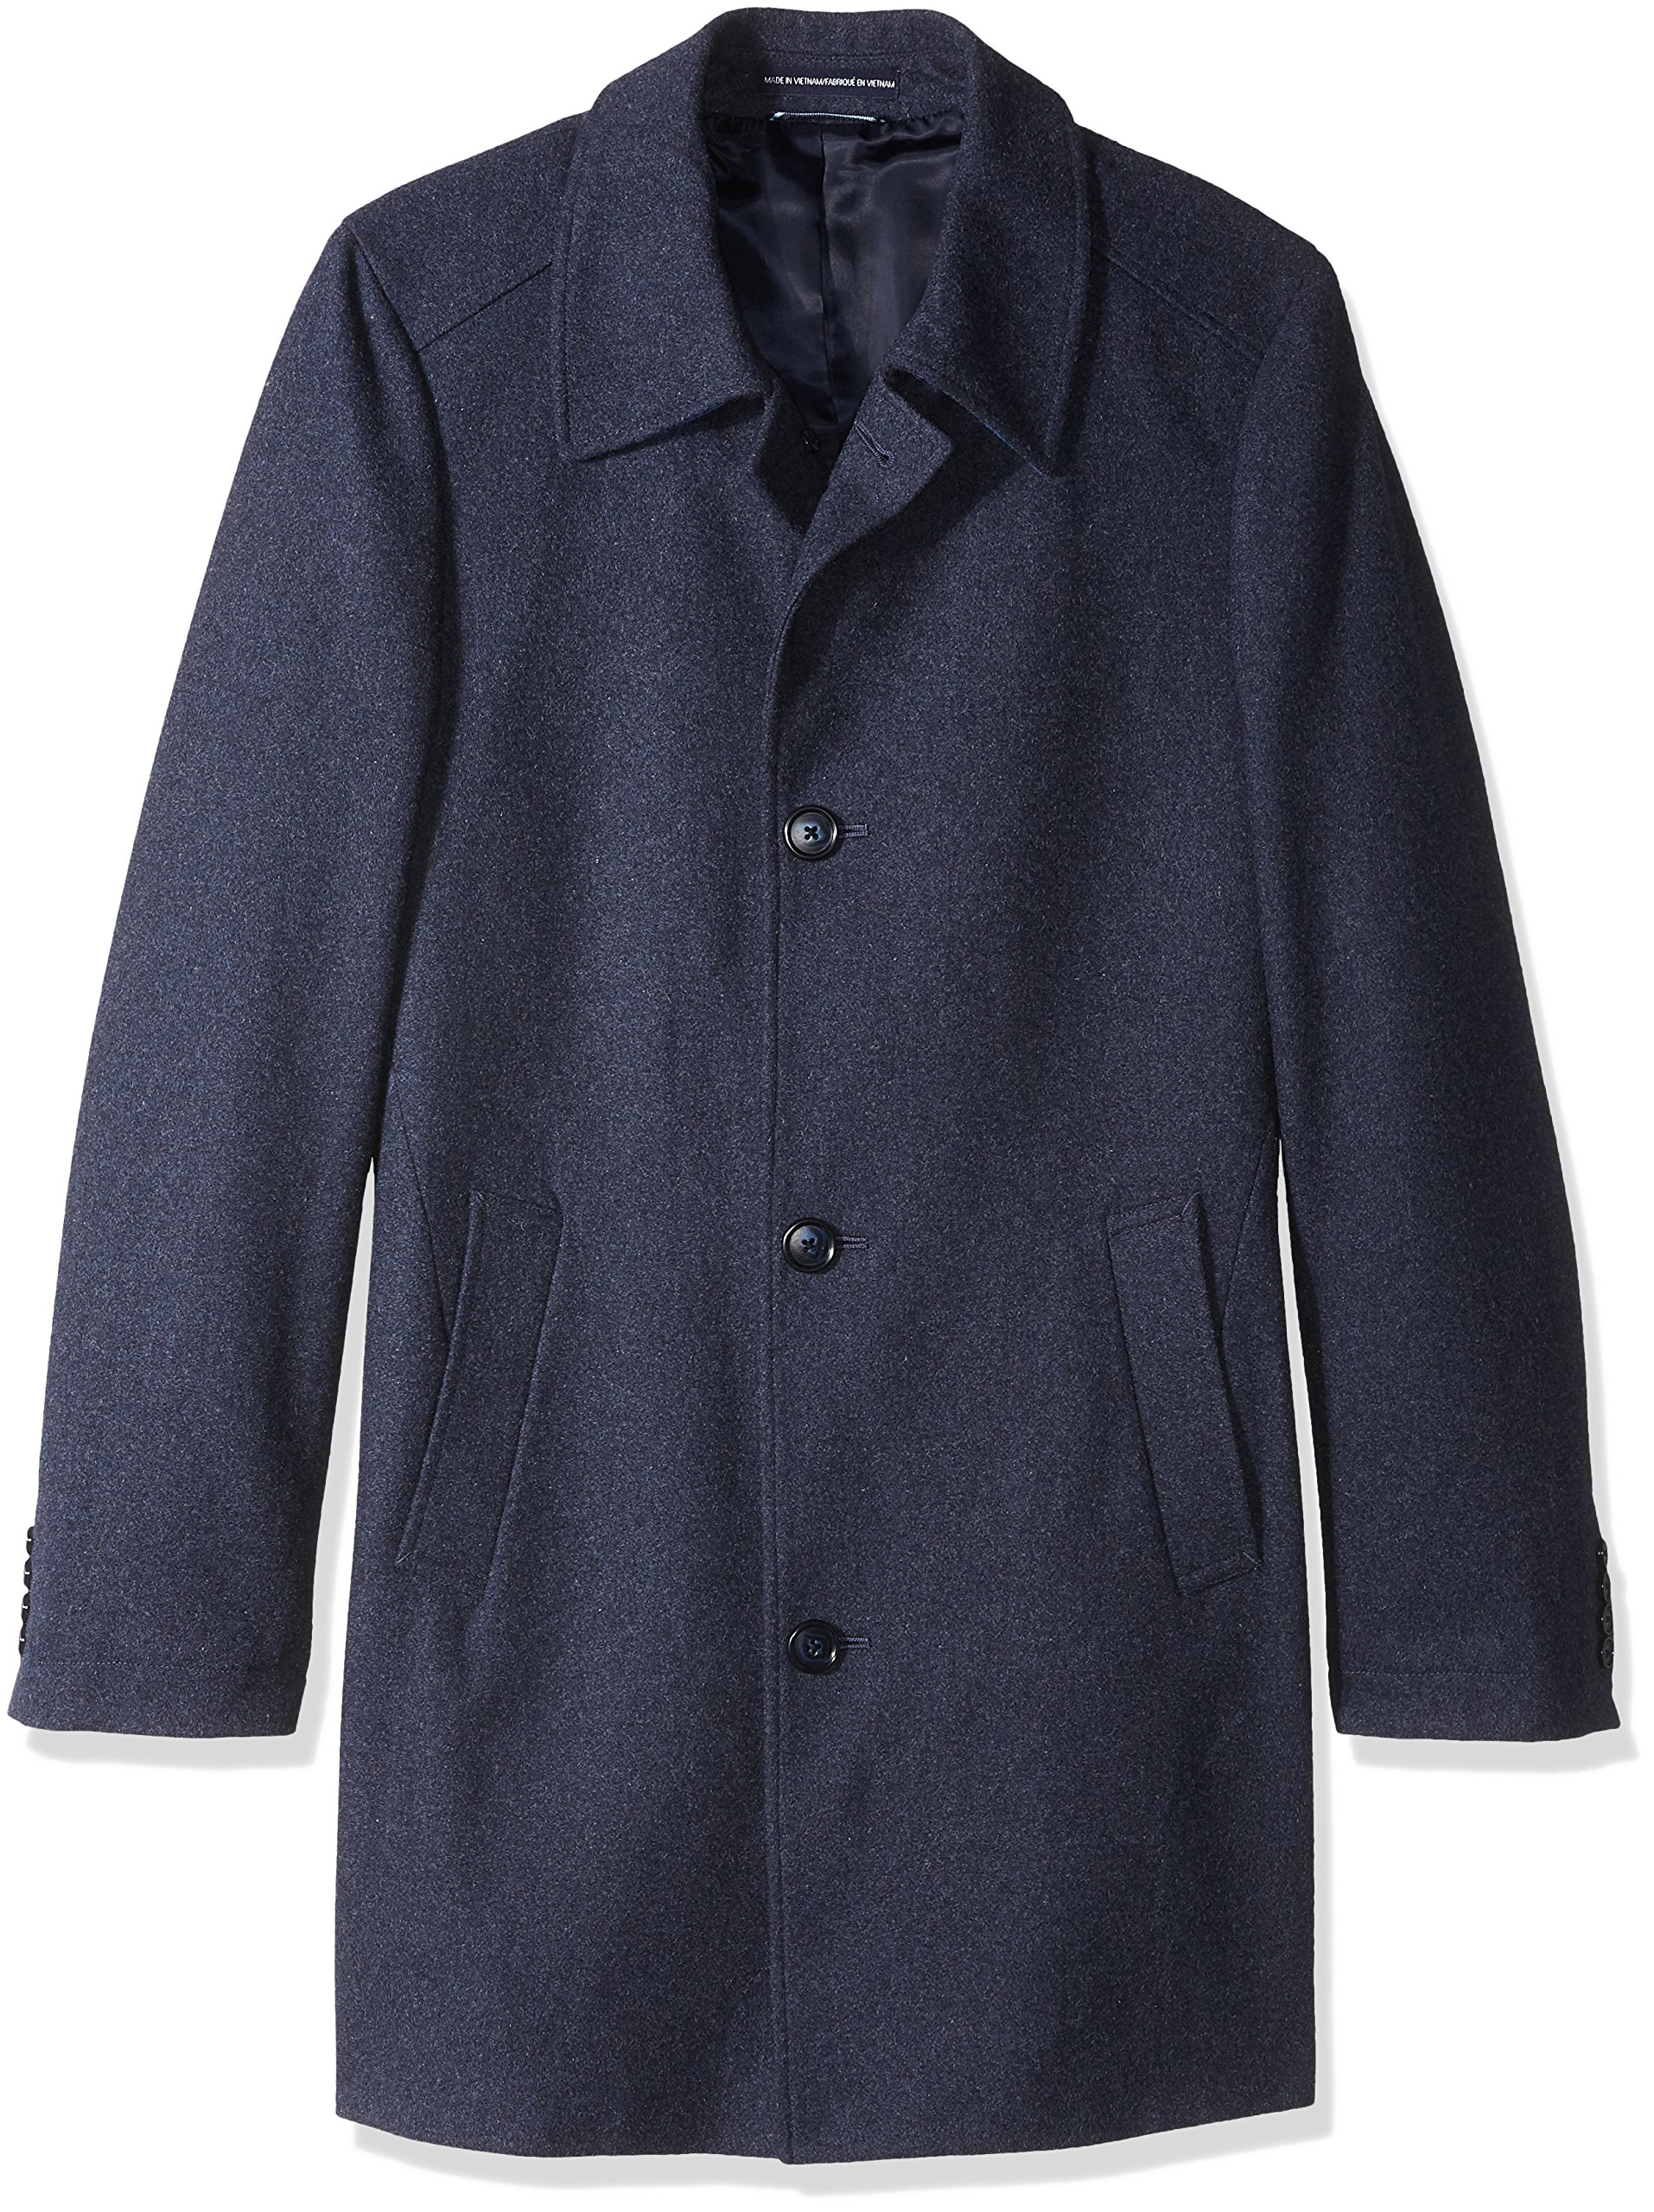 Tommy Hilfiger Men's Bloom 35 inch Top Coat, Blue, 40R by Tommy Hilfiger